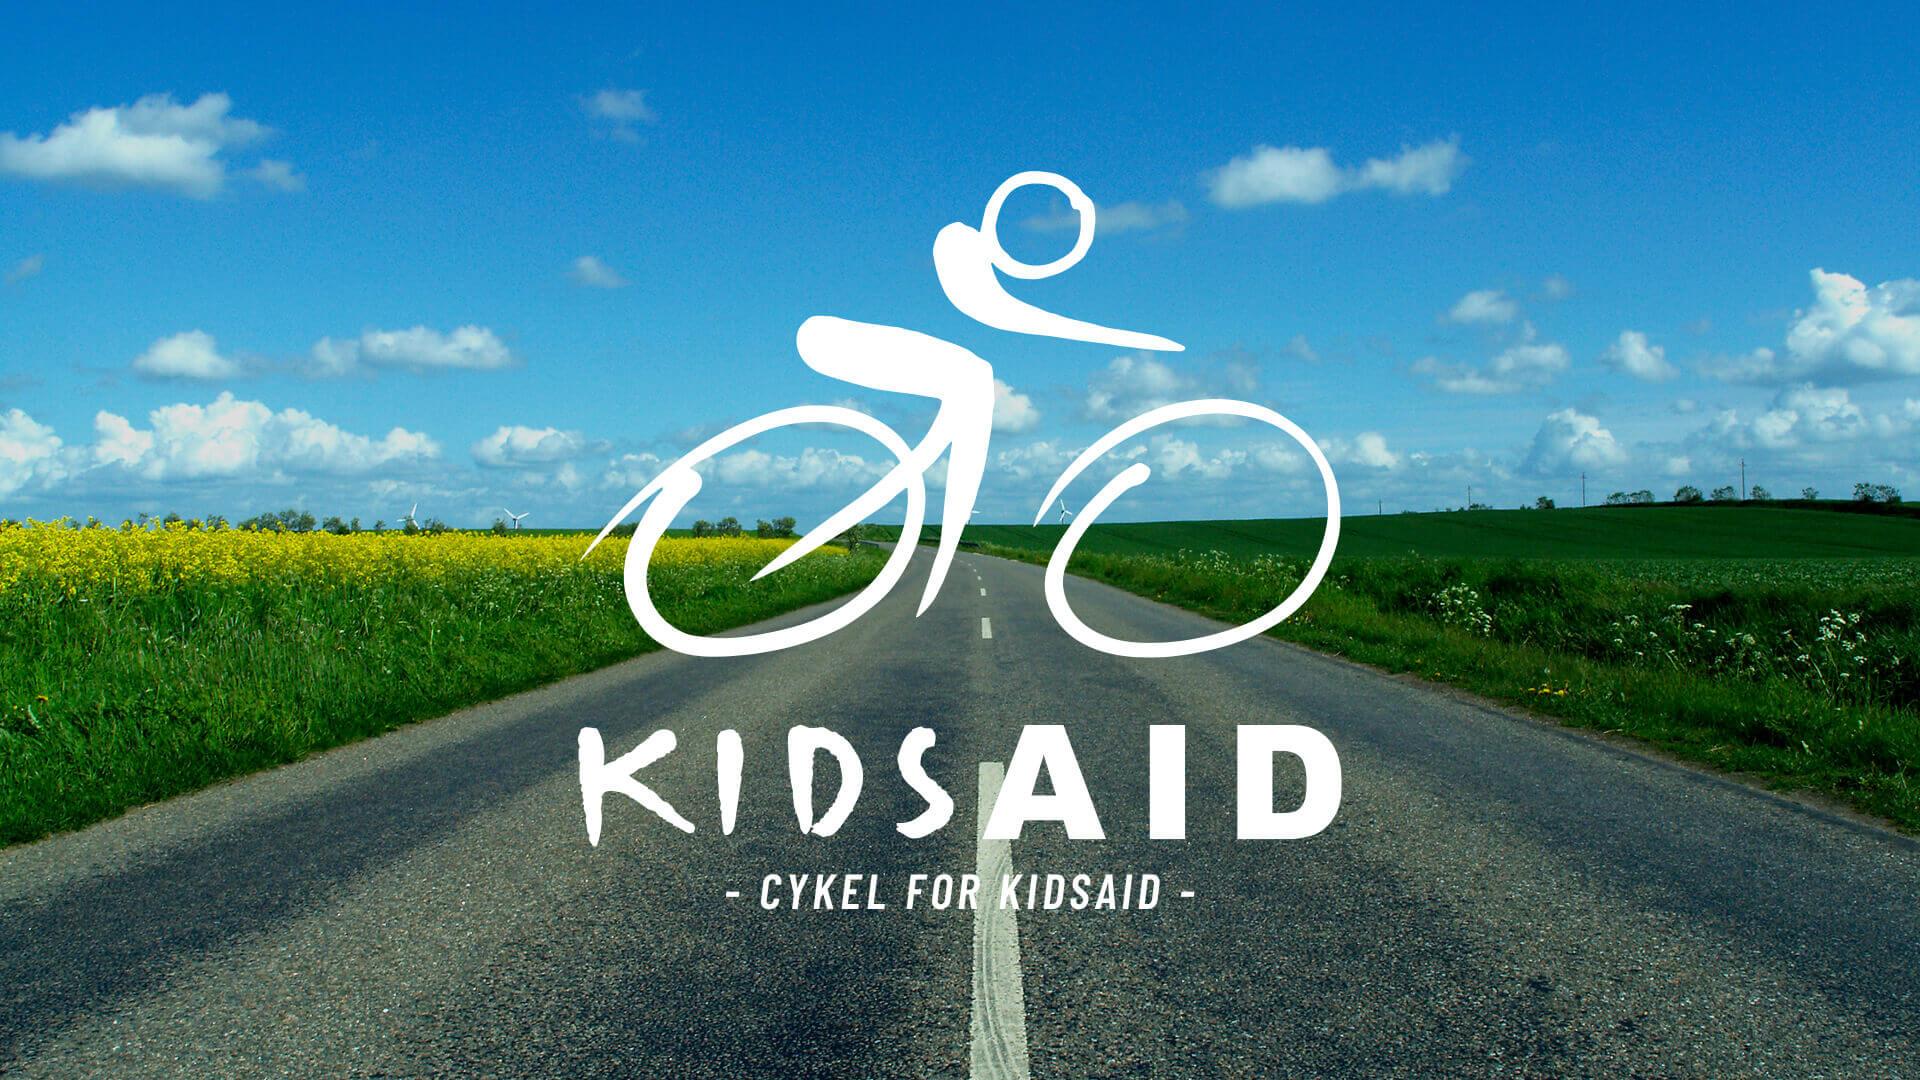 Cykel for KidsAid